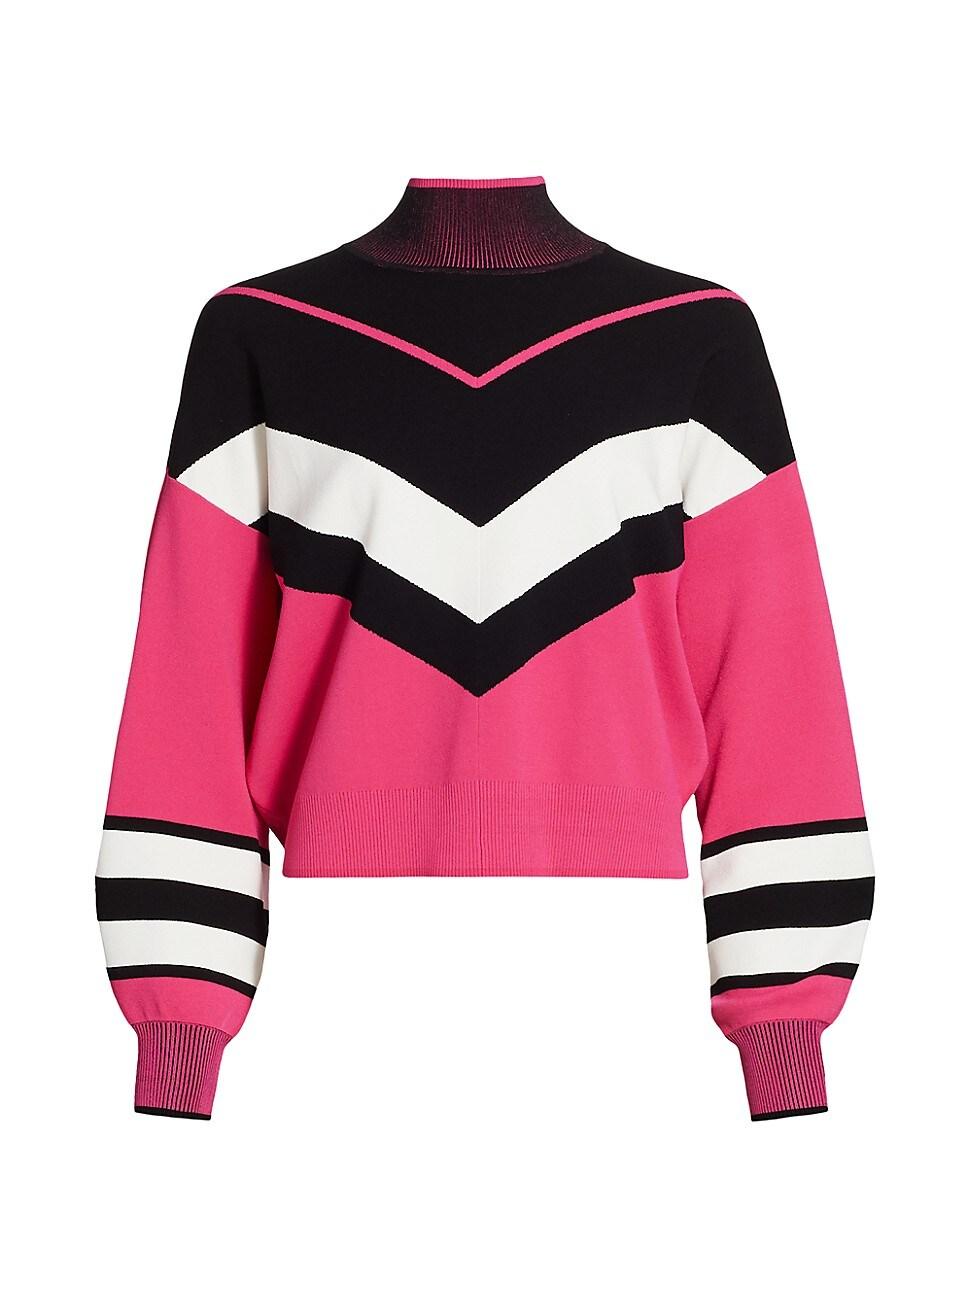 Tanya Taylor Women's Kyra Chevron Knit Turtleneck In Pink/ Black/ White